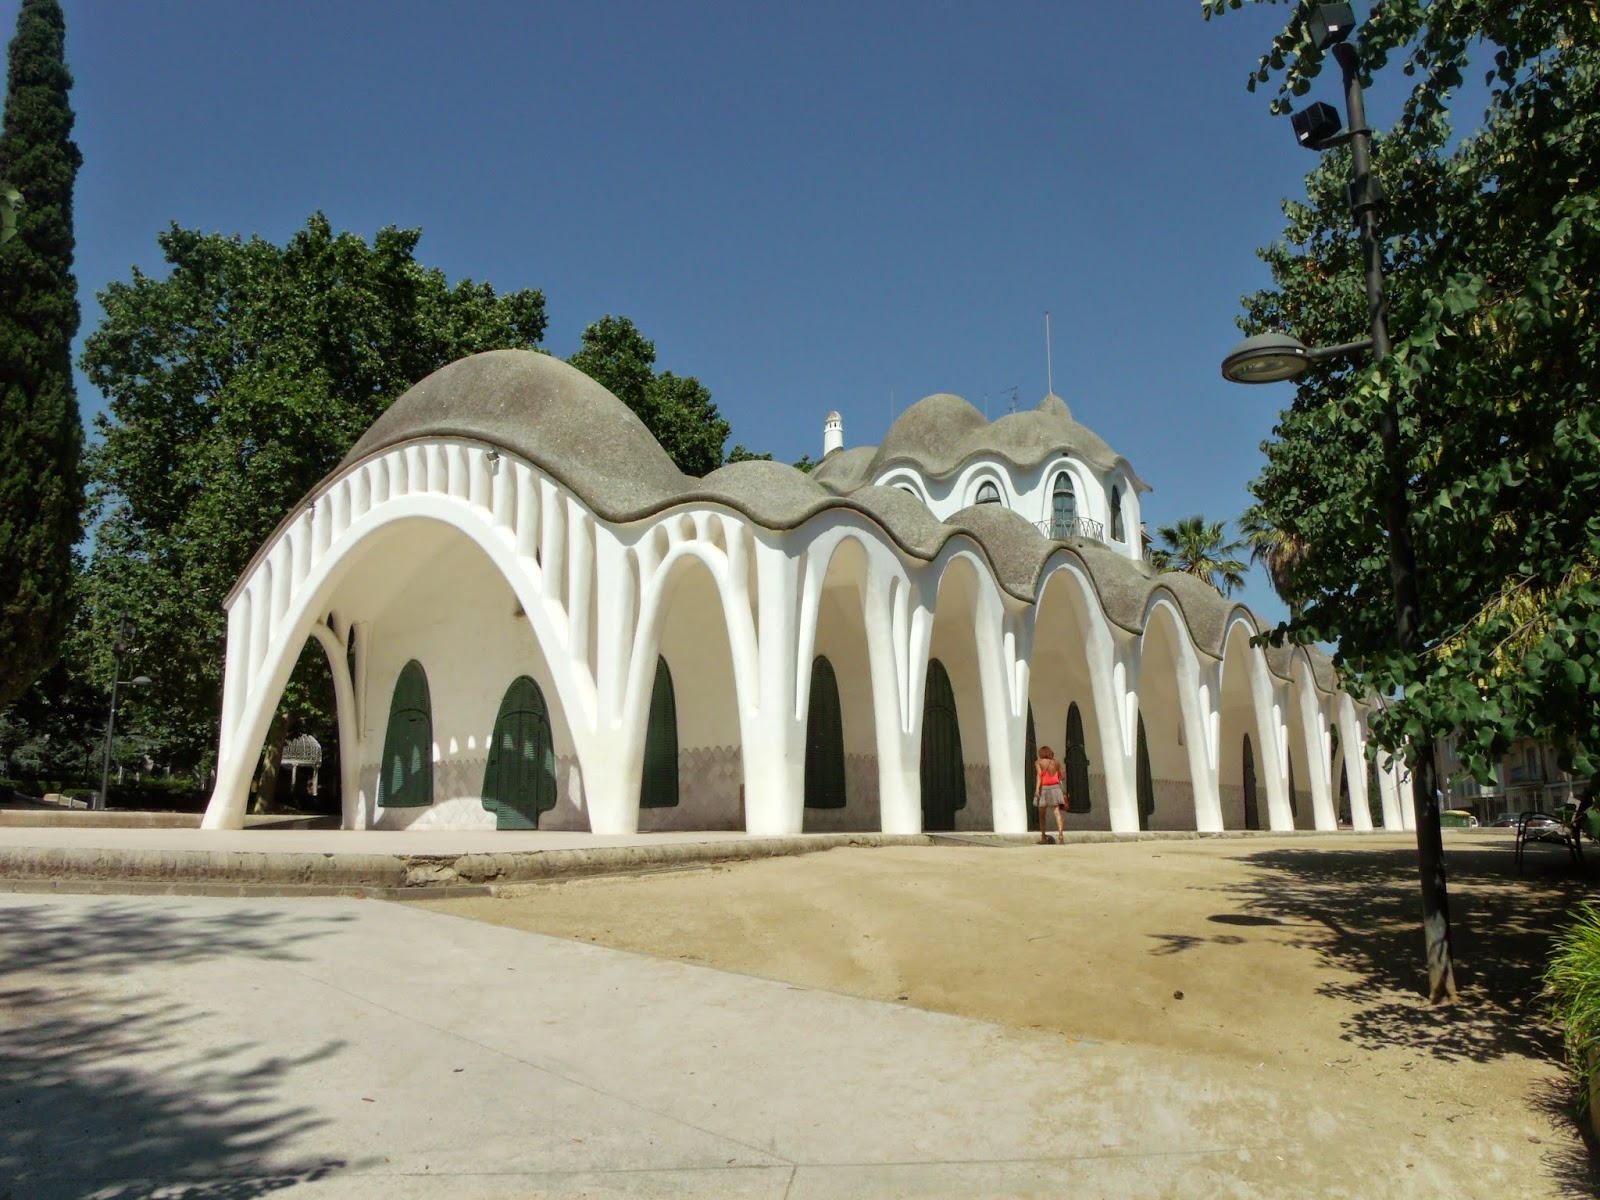 Paseos art nouveau masia freixa parc de sant jordi - Masias en terrassa ...